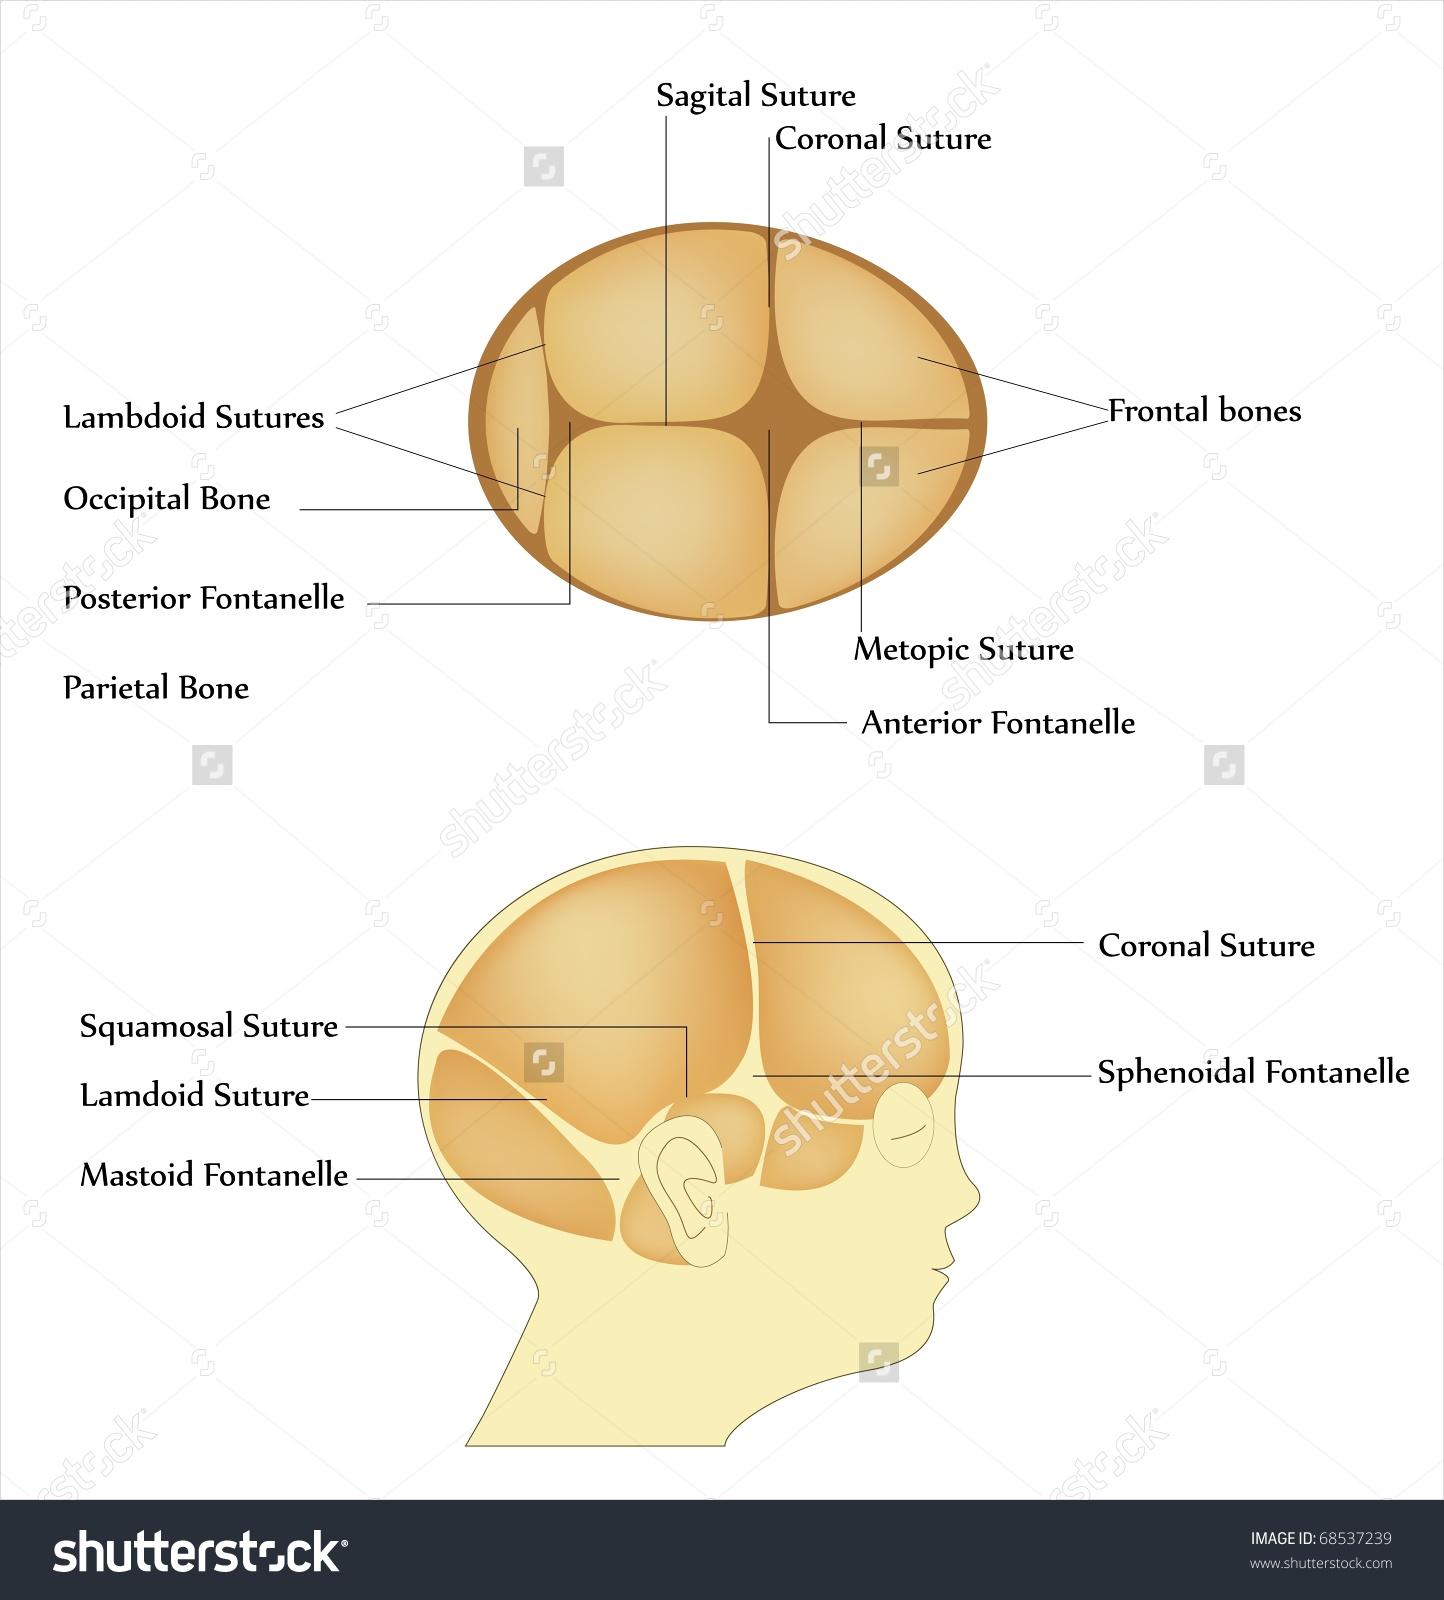 Newborn Skull Bones Fontanel Sutures Stock Illustration 68537239.